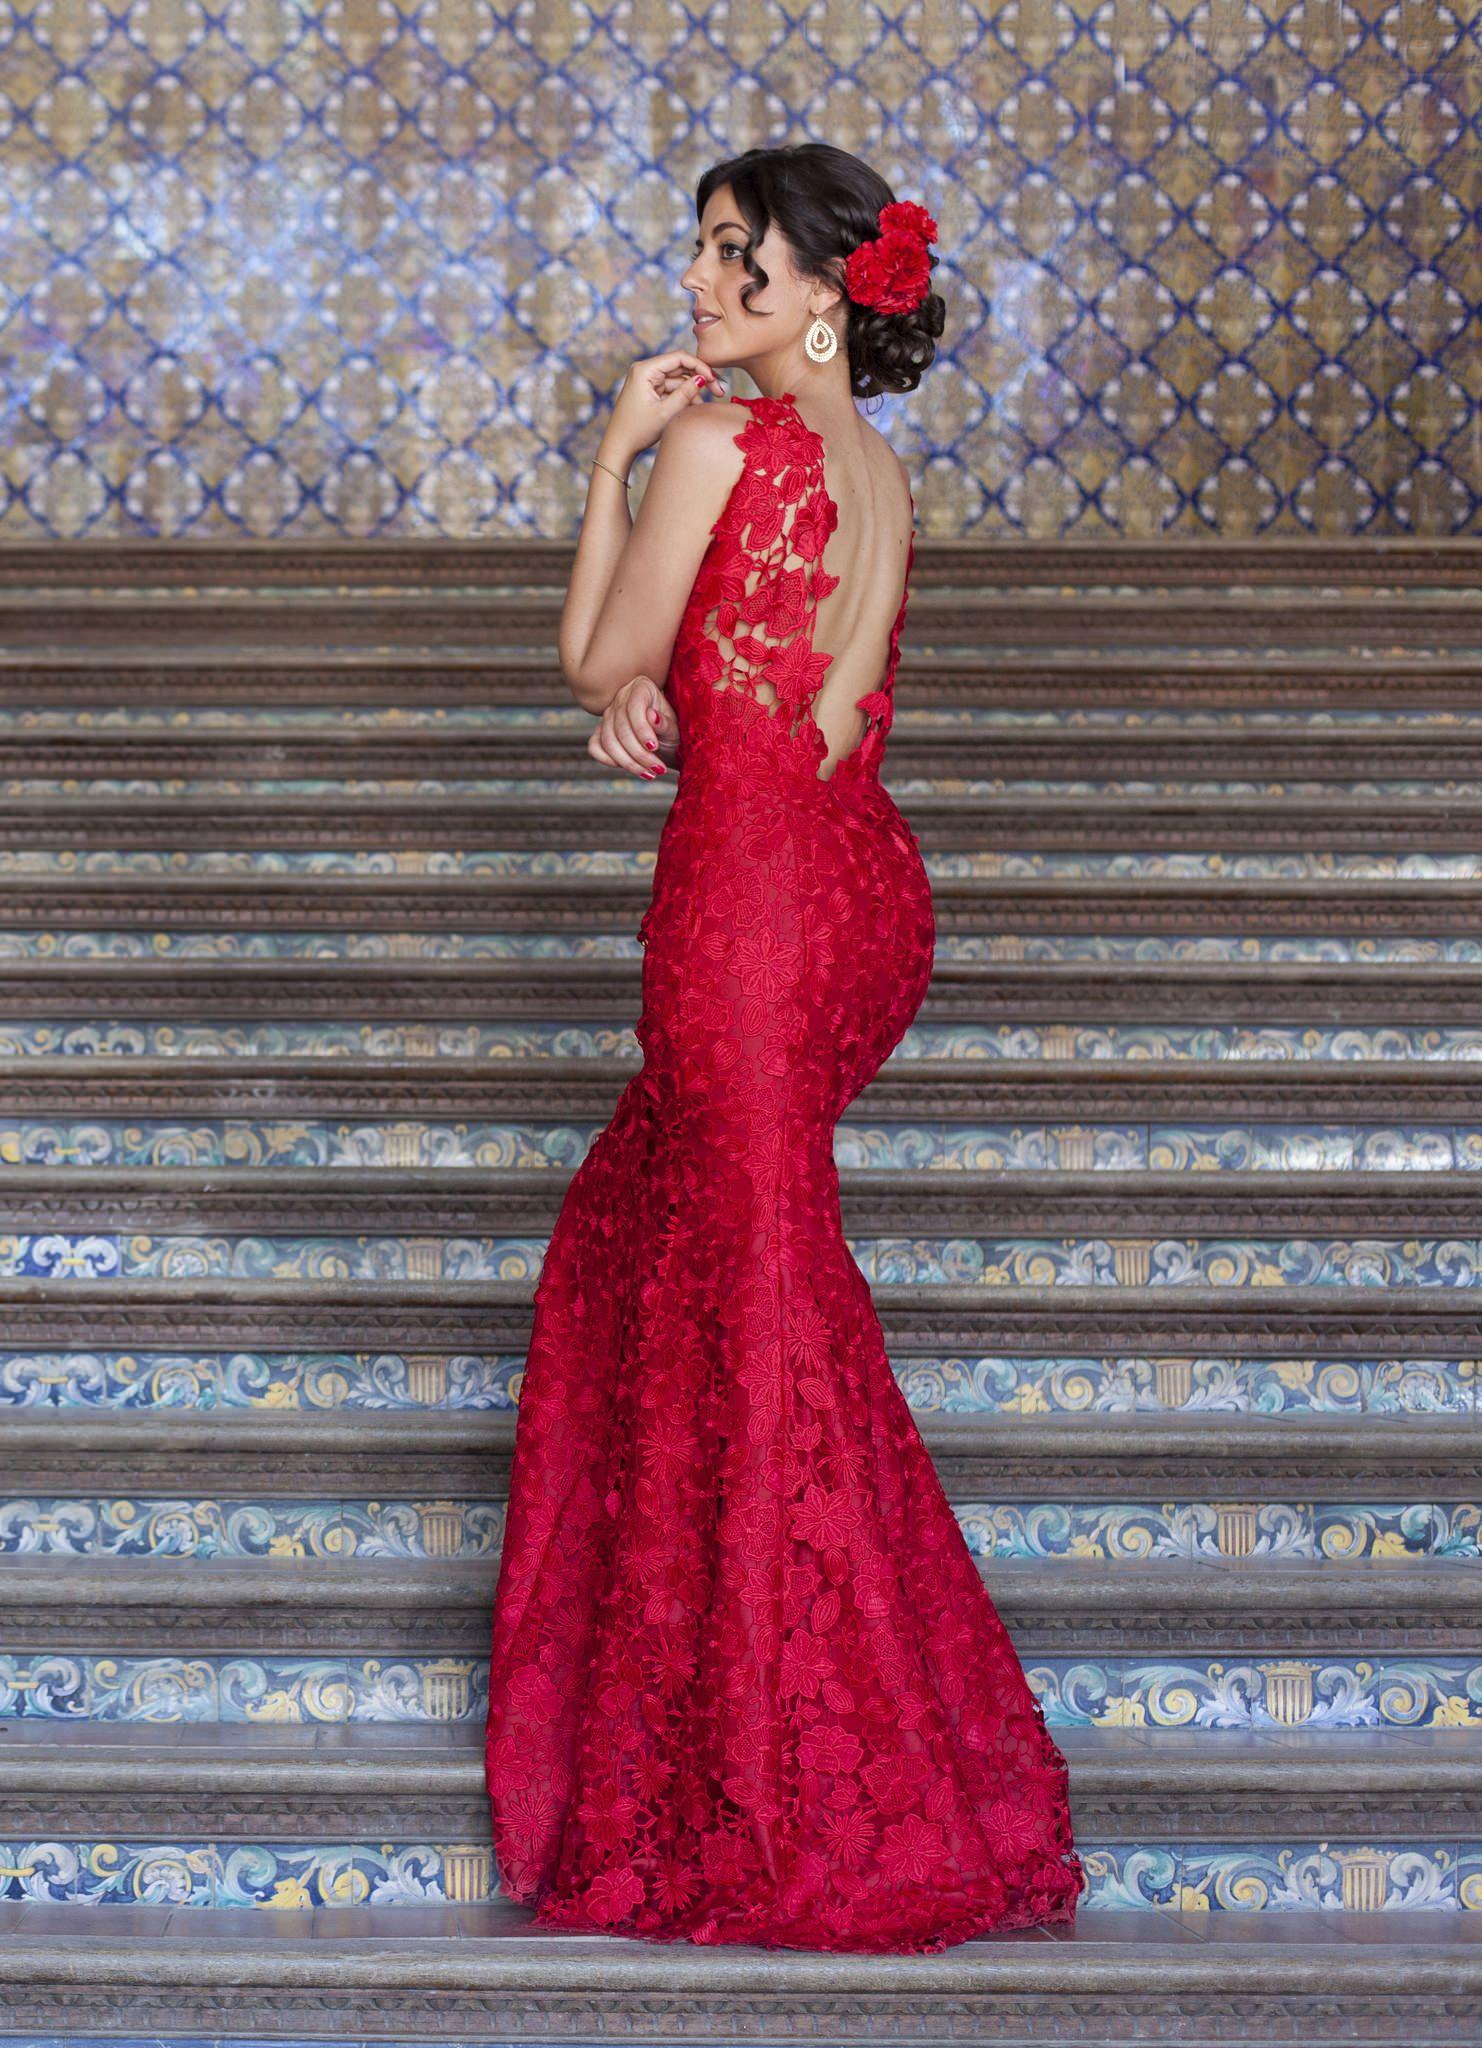 Red dress for wedding reception  MG copia  vestidos de mujer  Pinterest  Flamenco Classy